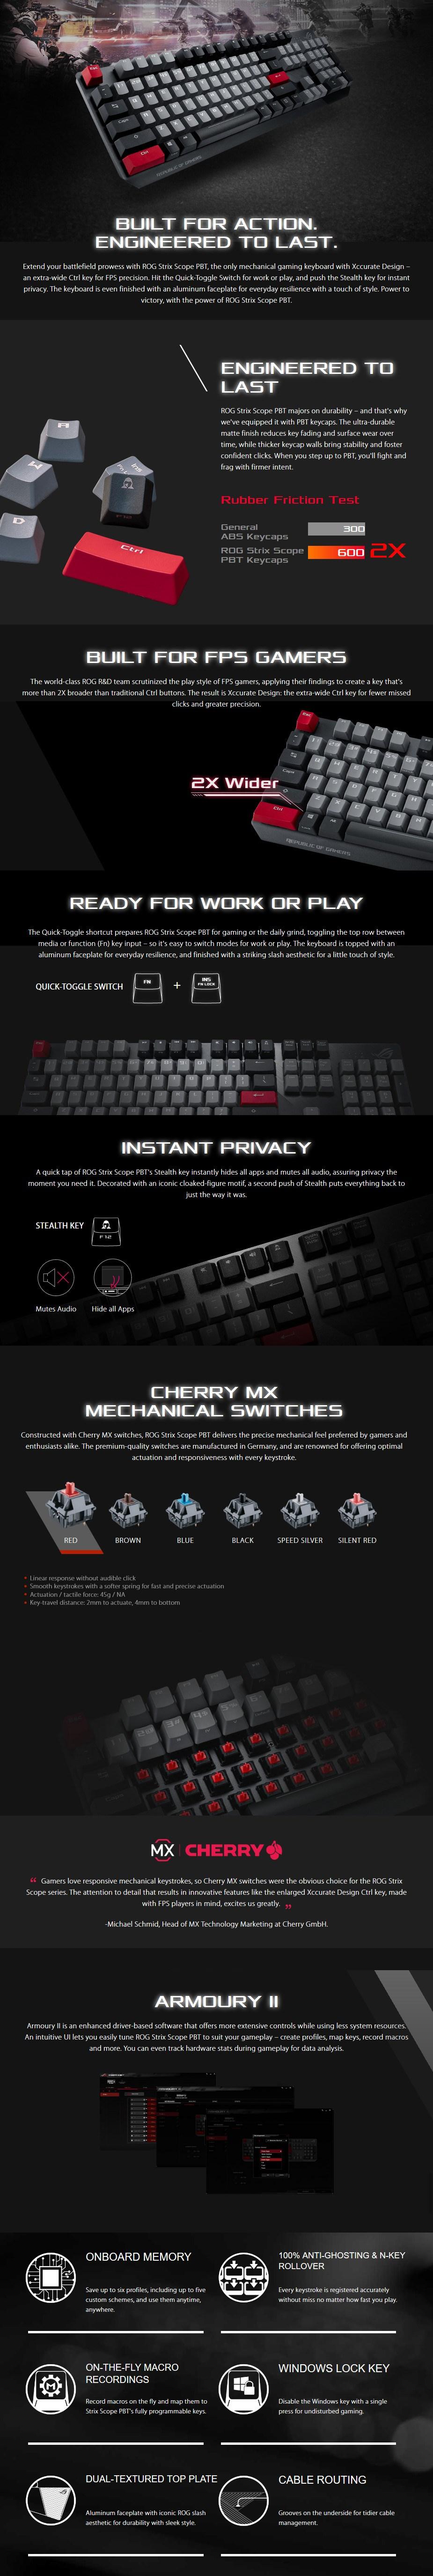 asus-rog-strix-scope-pbt-mechanical-gaming-keyboard-cherry-mx-red-ac31970-5.jpg